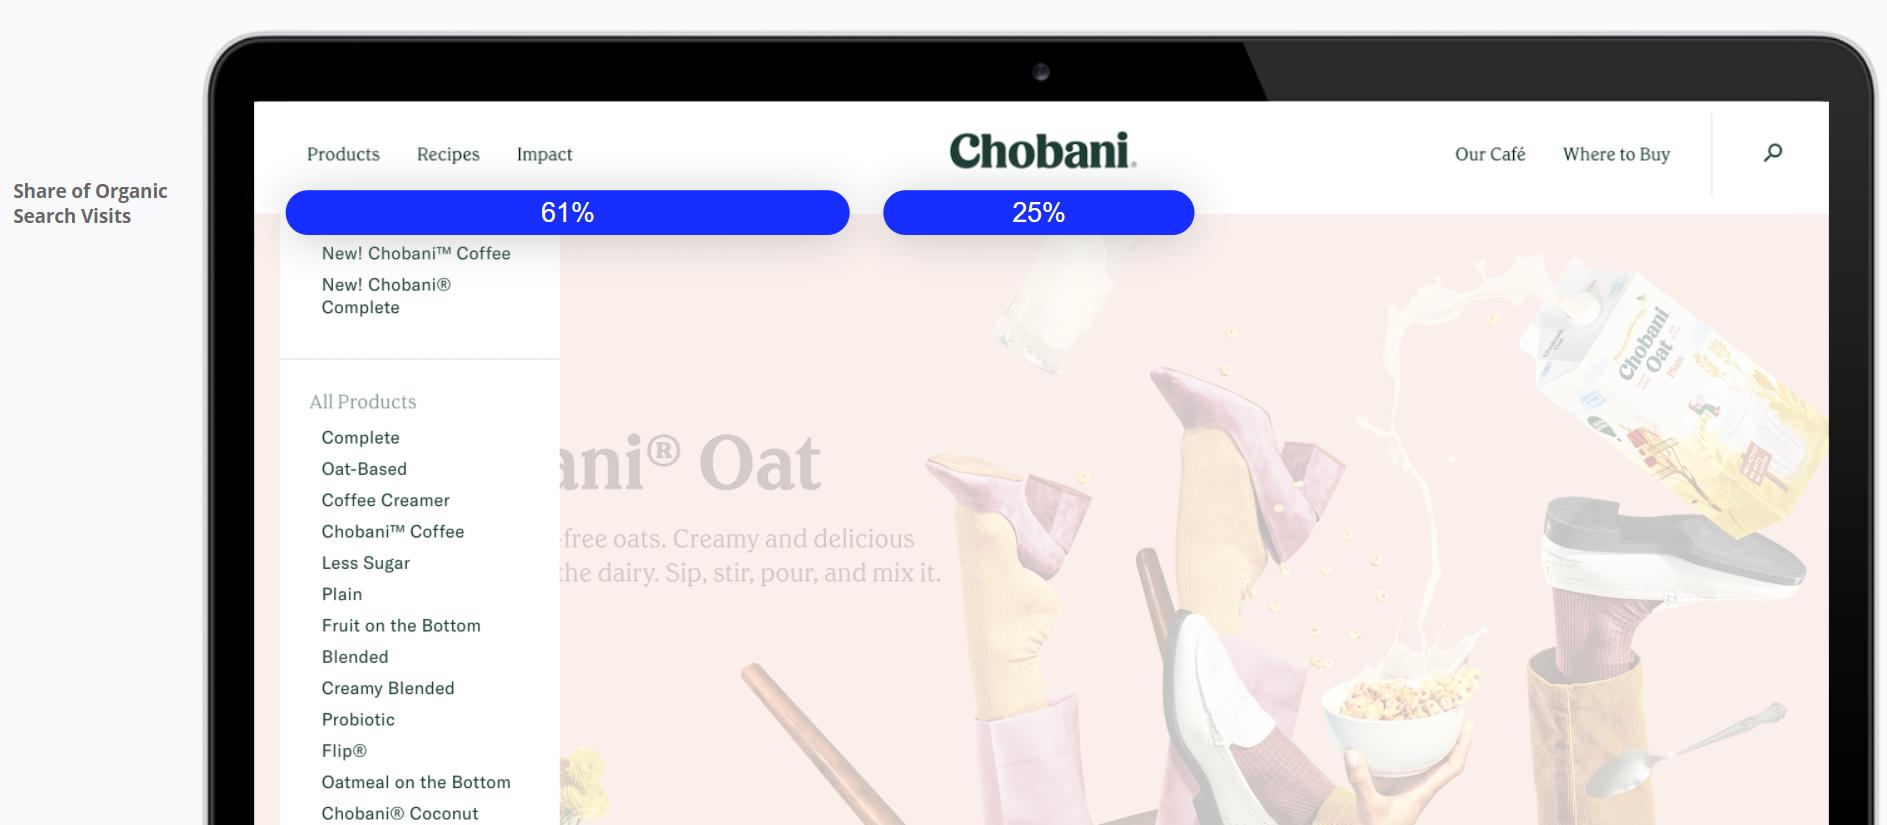 Chobani - Share of Organic Search Visits